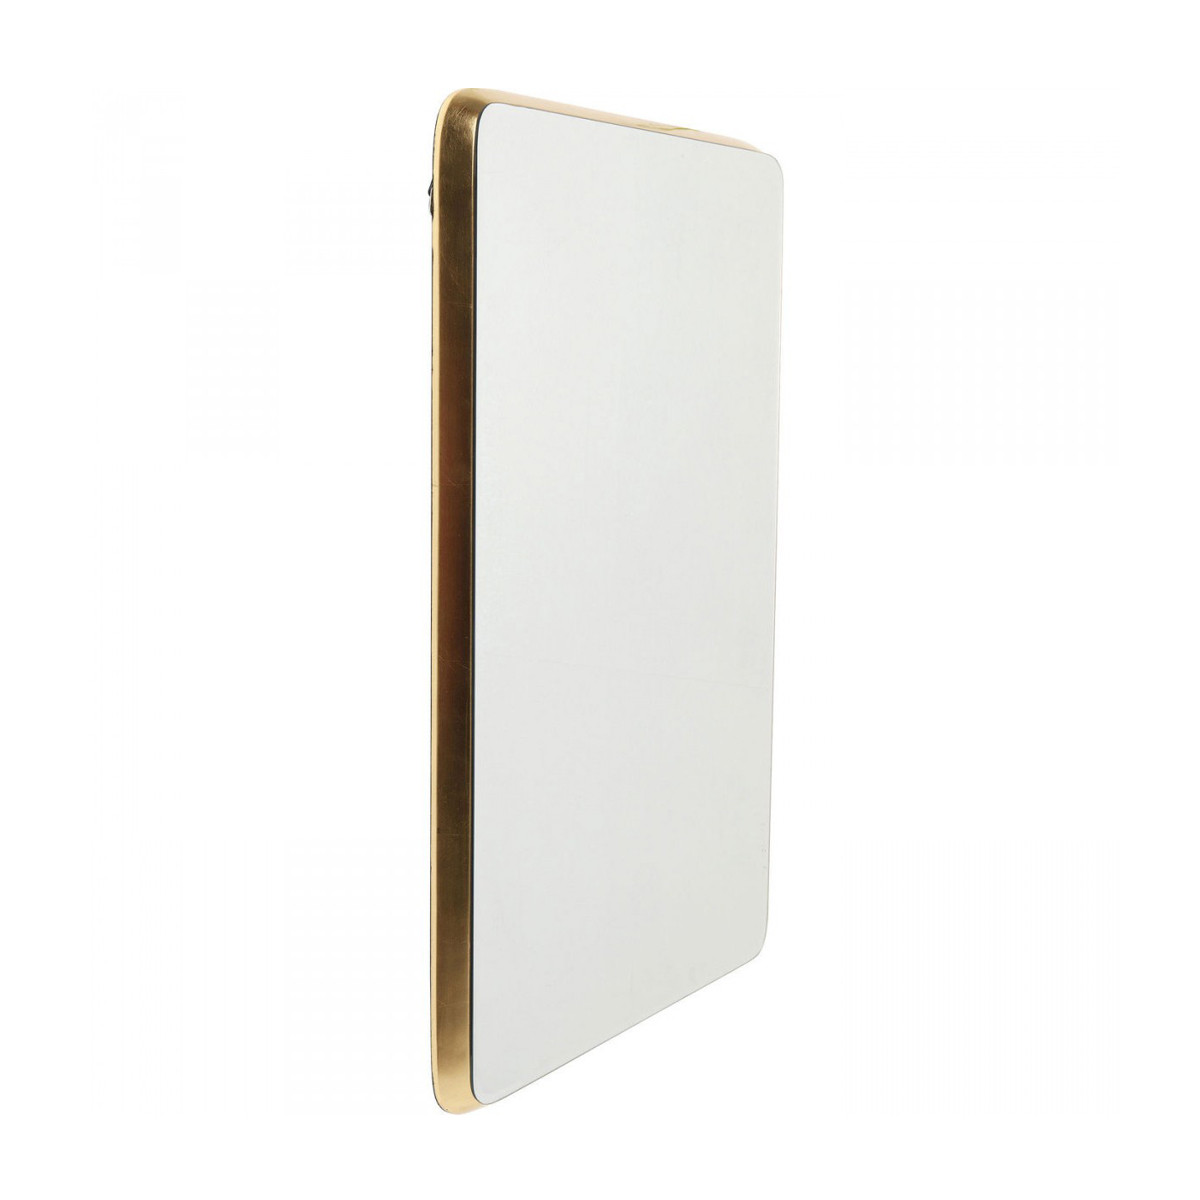 Uitgelezene Kare Design Jetset | Rechthoekige spiegel goud | 80948 | LUMZ CH-02